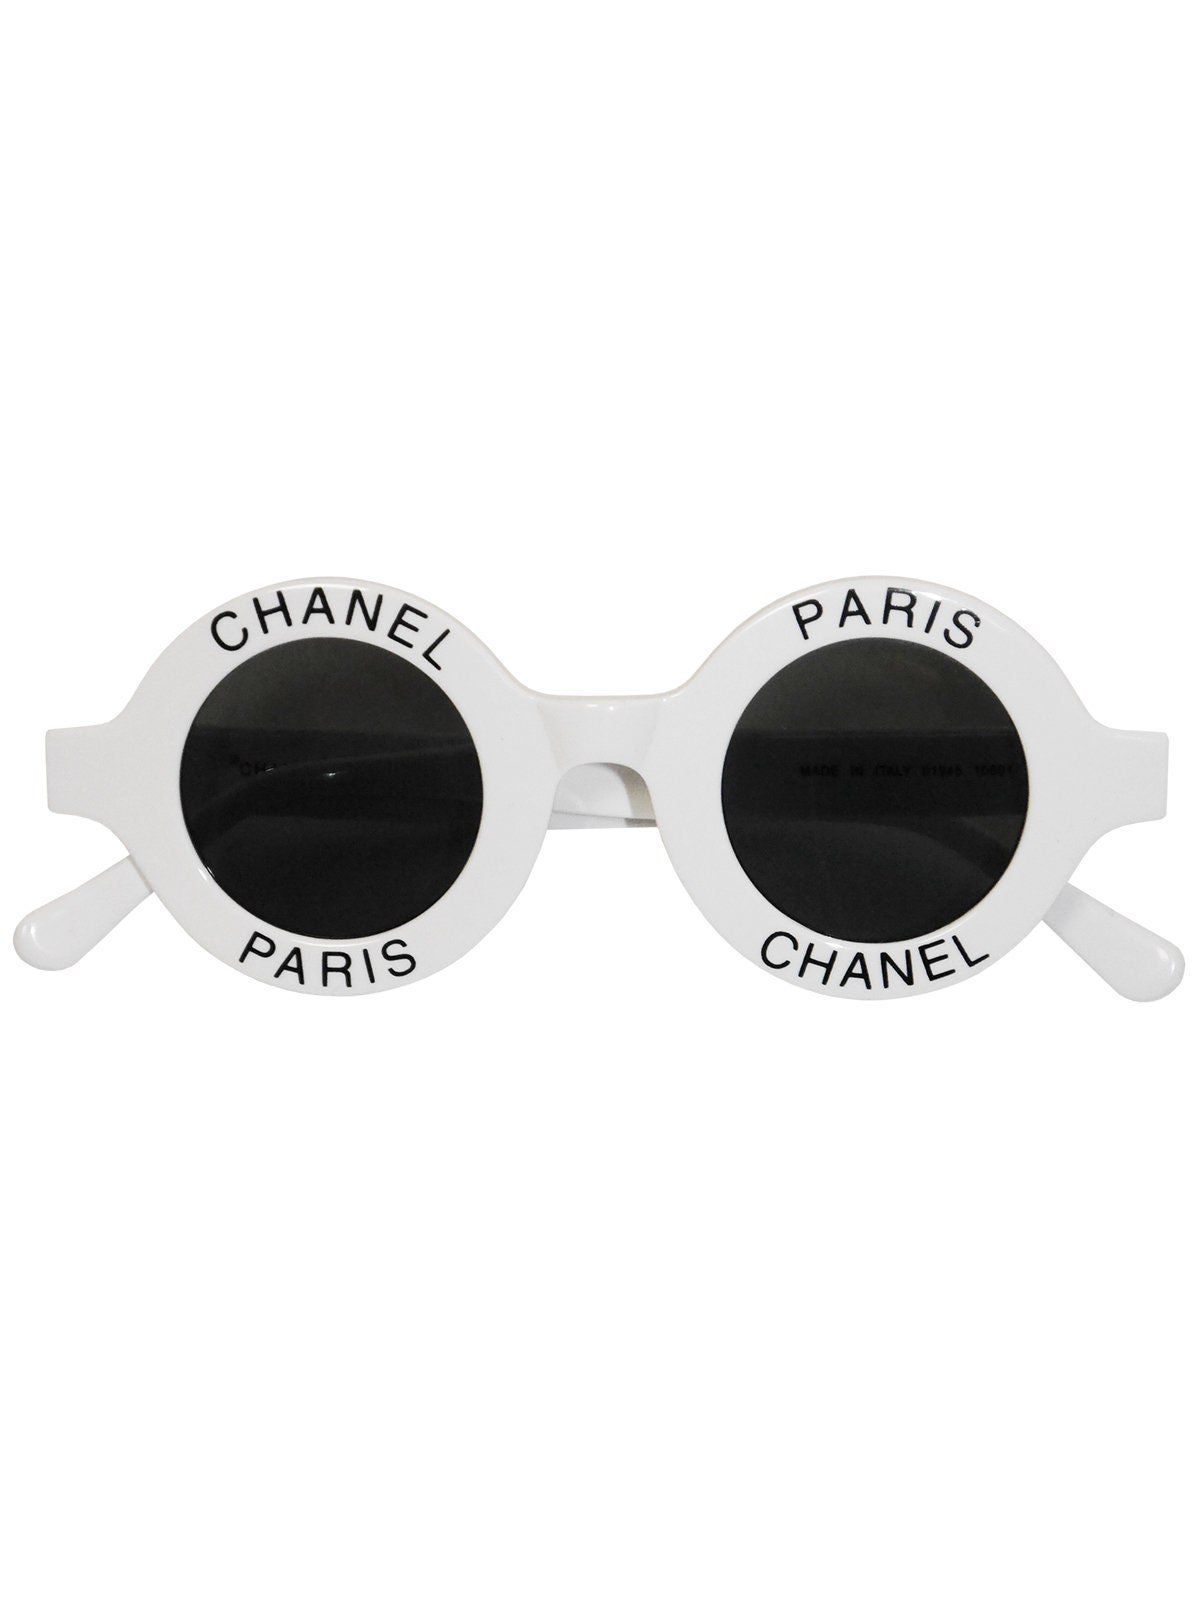 b6a1ae9335 CHANEL S S 1993 Vintage Round Logo Signature Sunglasses White